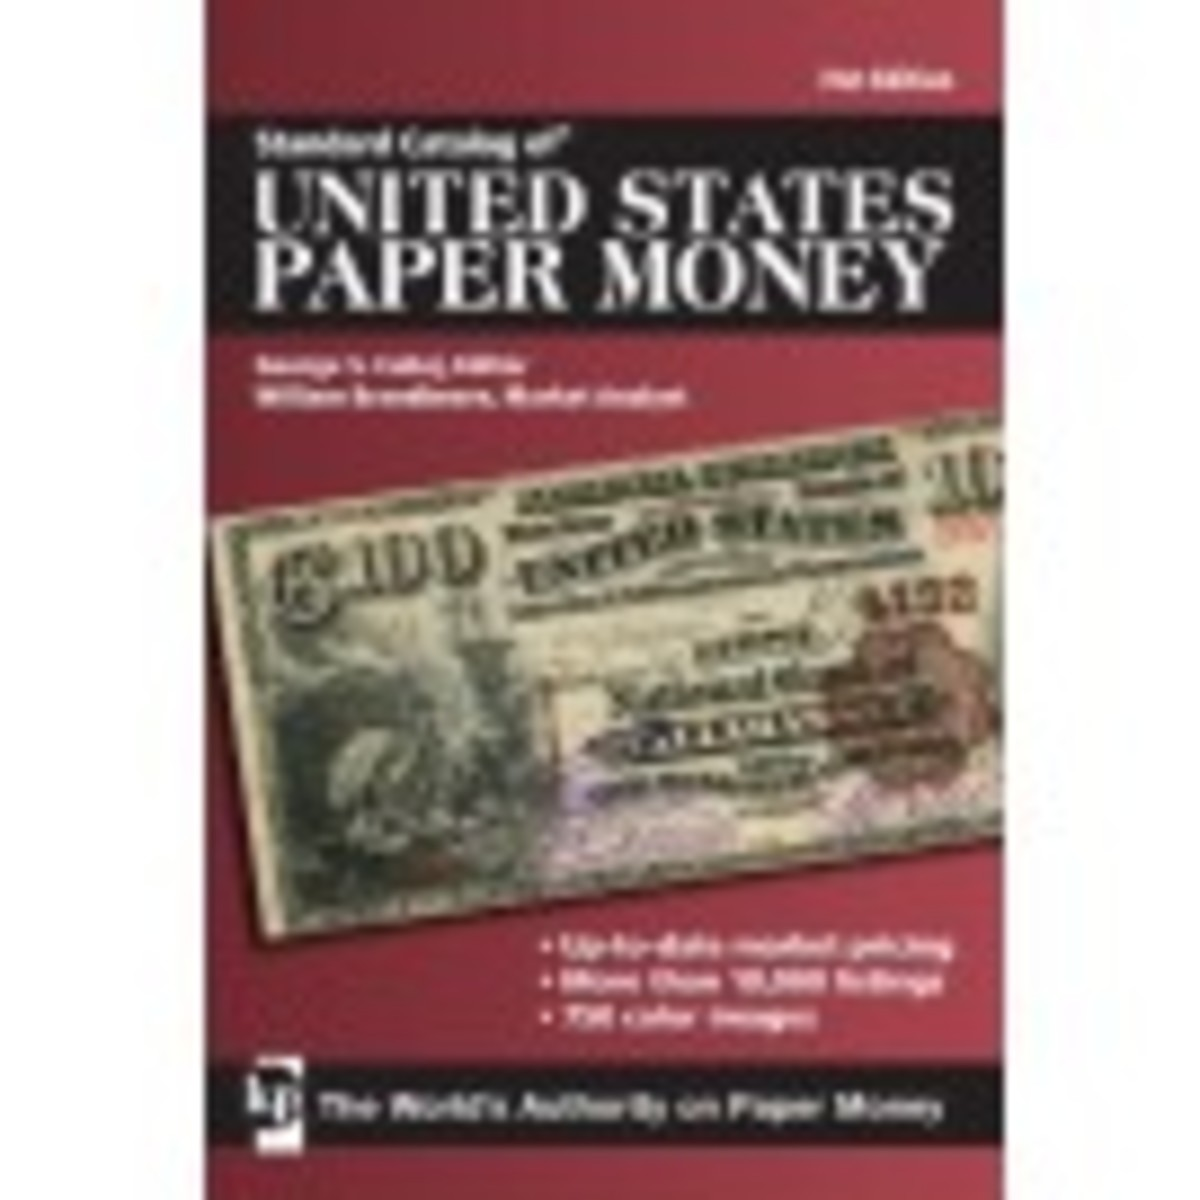 Standard Catalog of United States Paper Money